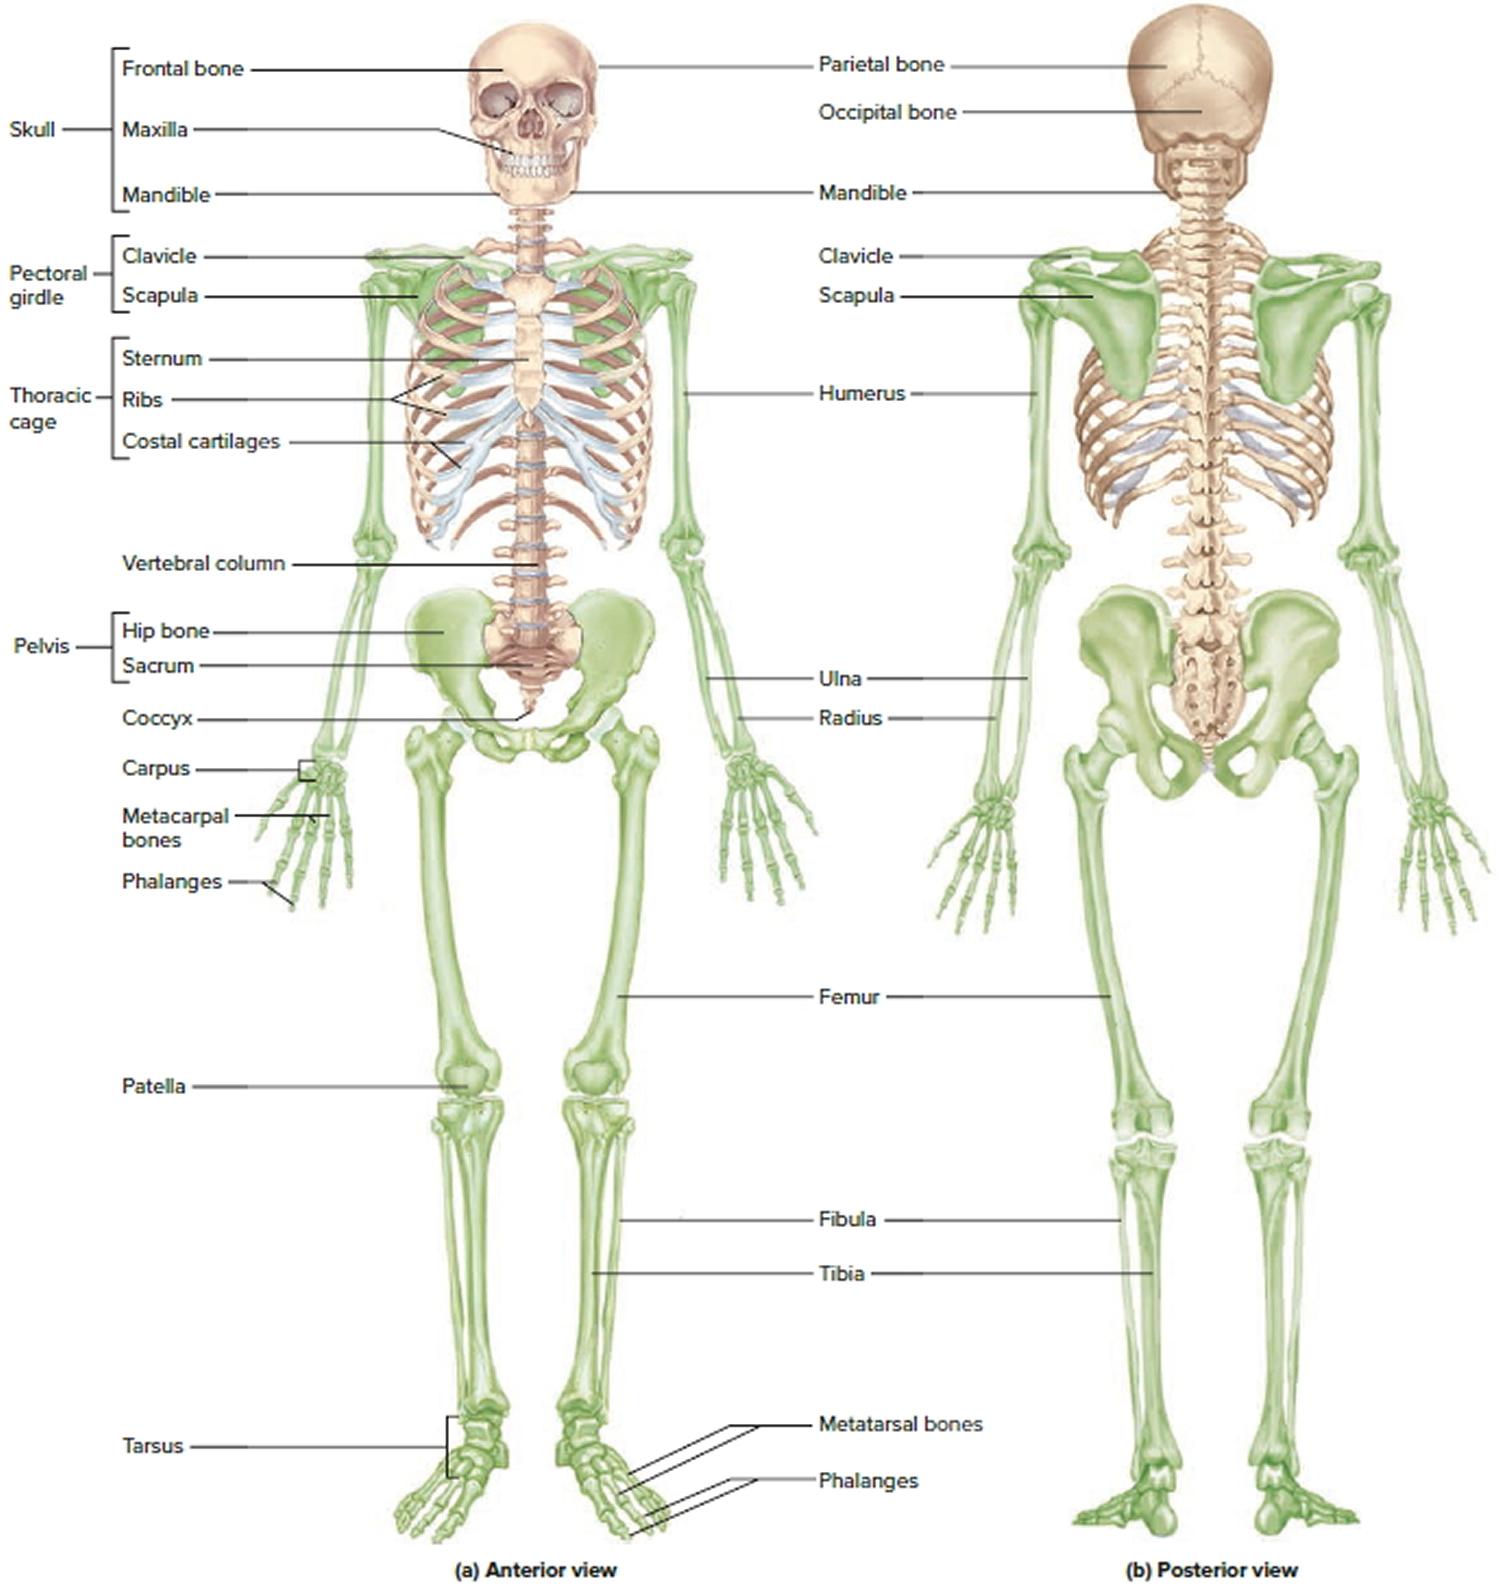 a labeled diagram of the skeletal system car audio wiring diagrams subwoofer human skeleton function bones